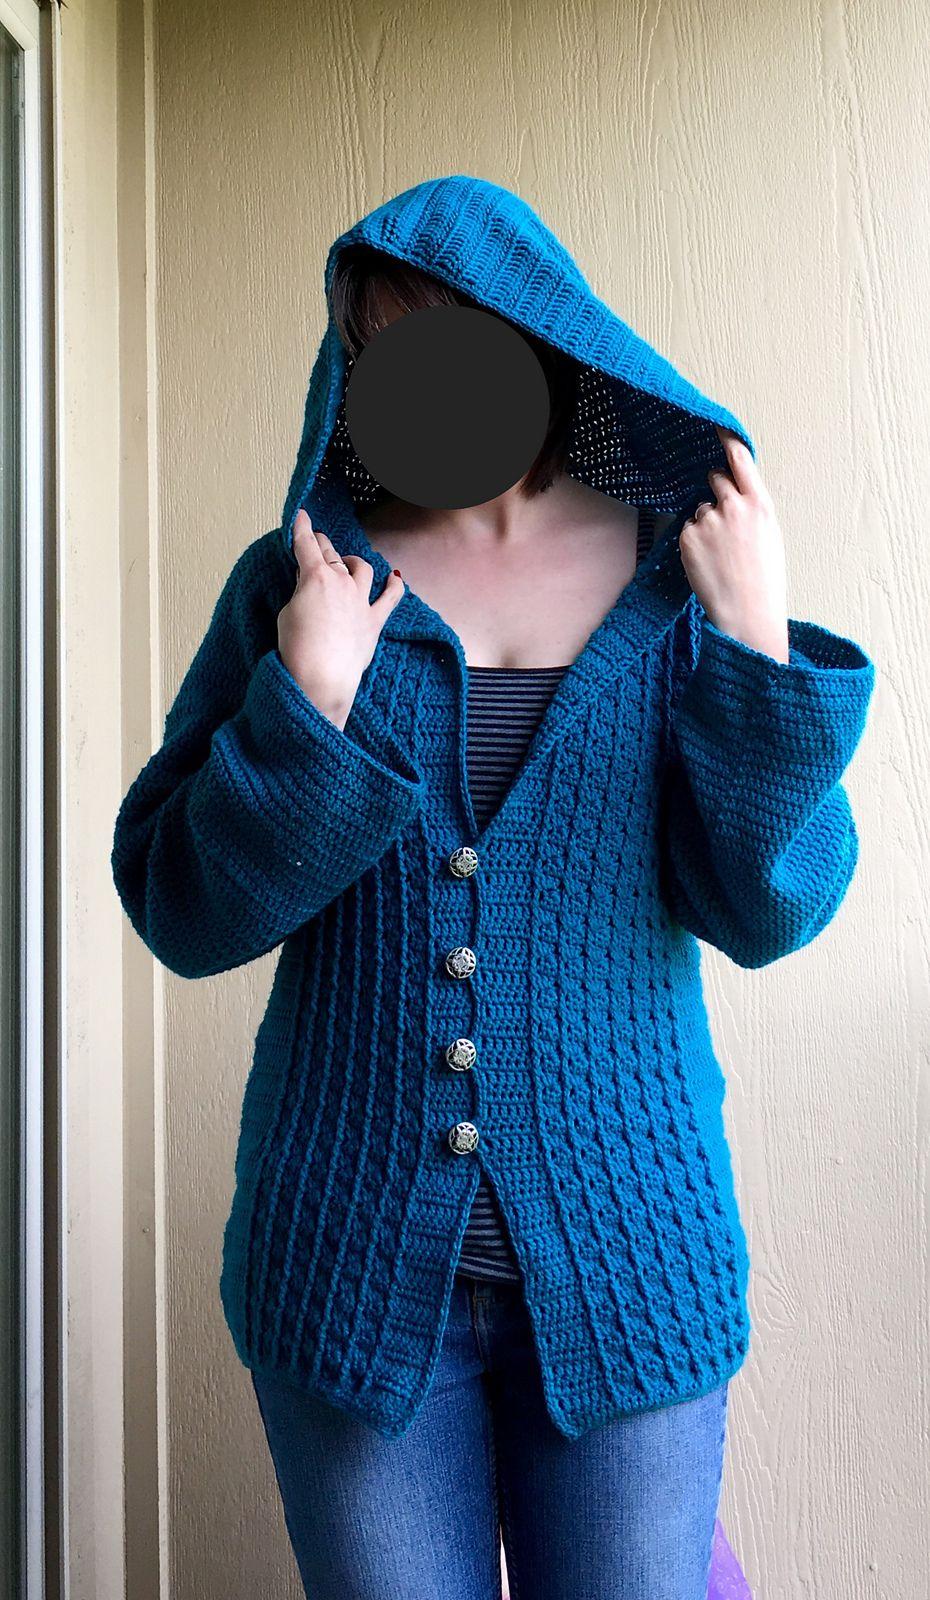 8405586eadc07 Overcast Sweater. Hooded JacketSweaterPattern LibraryAlbumRavelryCrochetingPatternsSweater  CardiganChrochet. Ravelry  Overcast Sweater by Maz Kwok